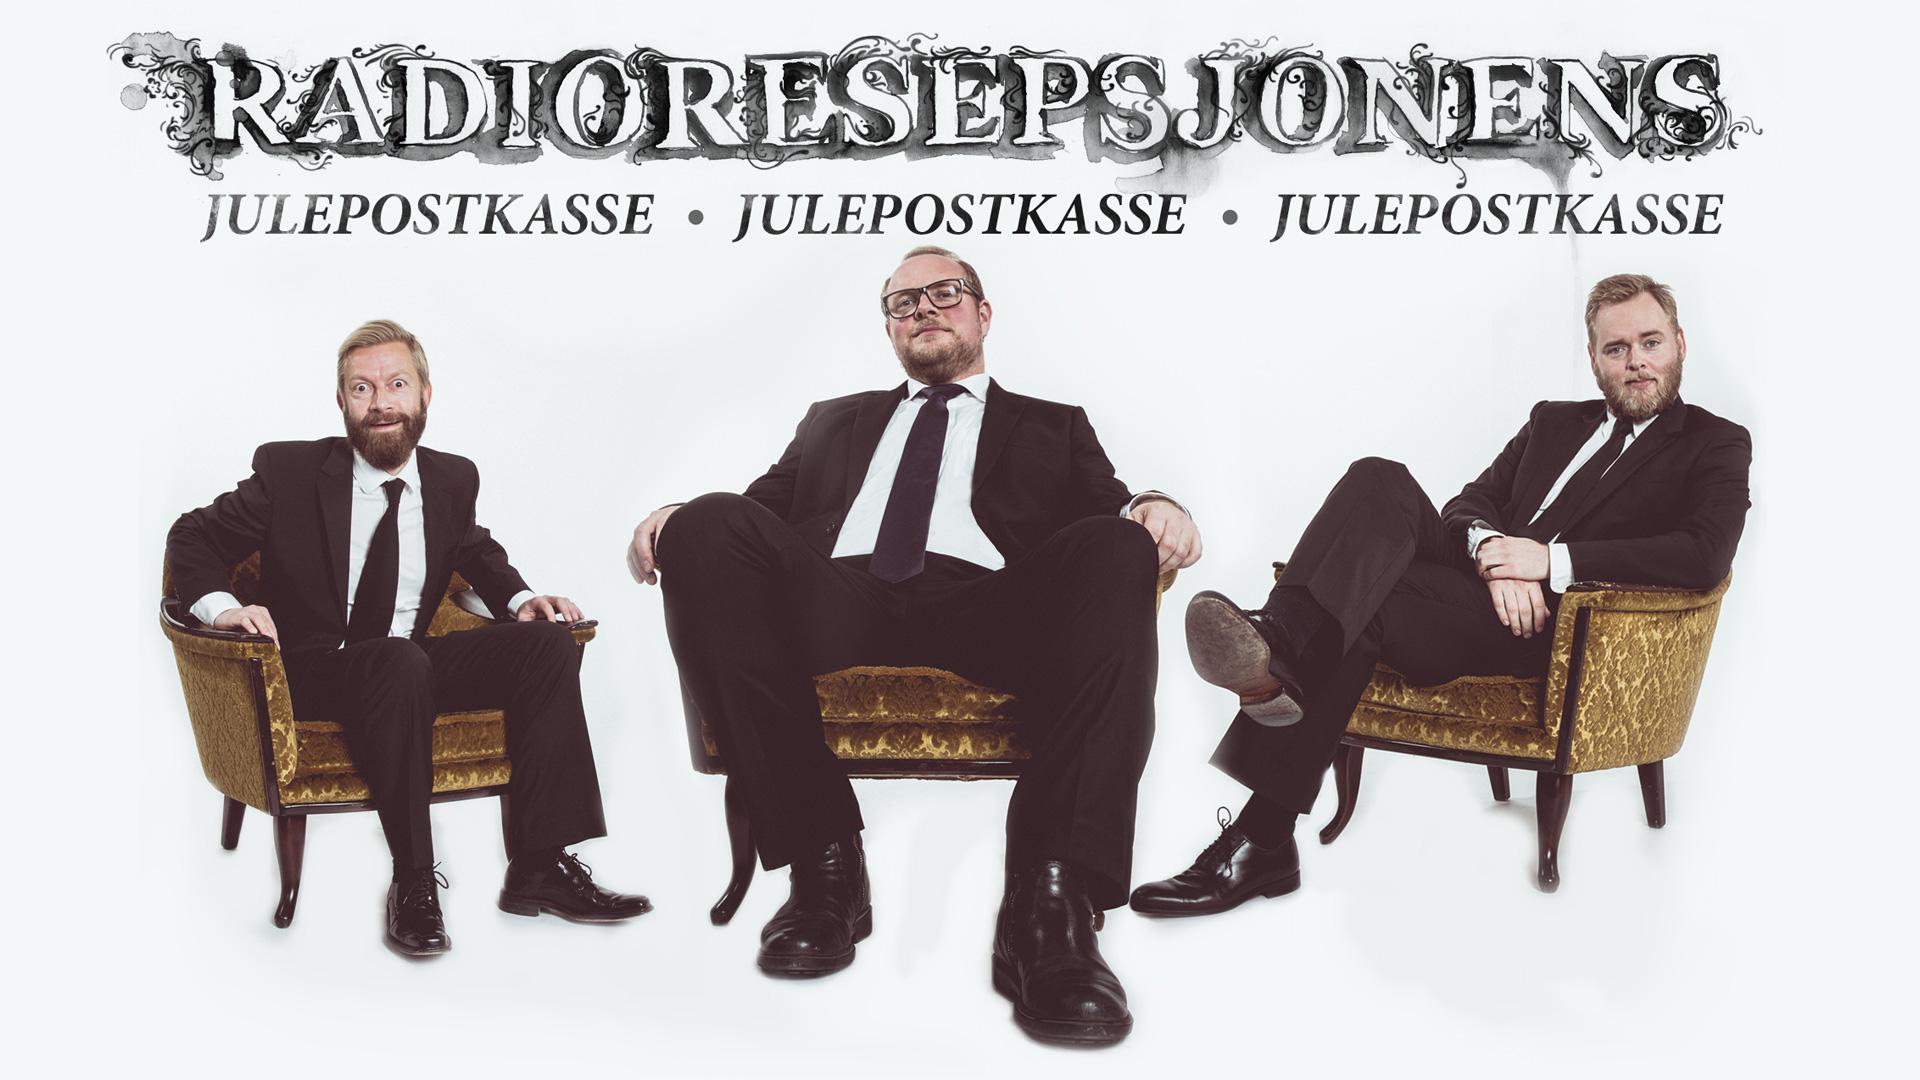 Radioresepsjonens julepostkasse julepostkasse julepostkasse (Foto: Kim Erlandsen, NRK P3).